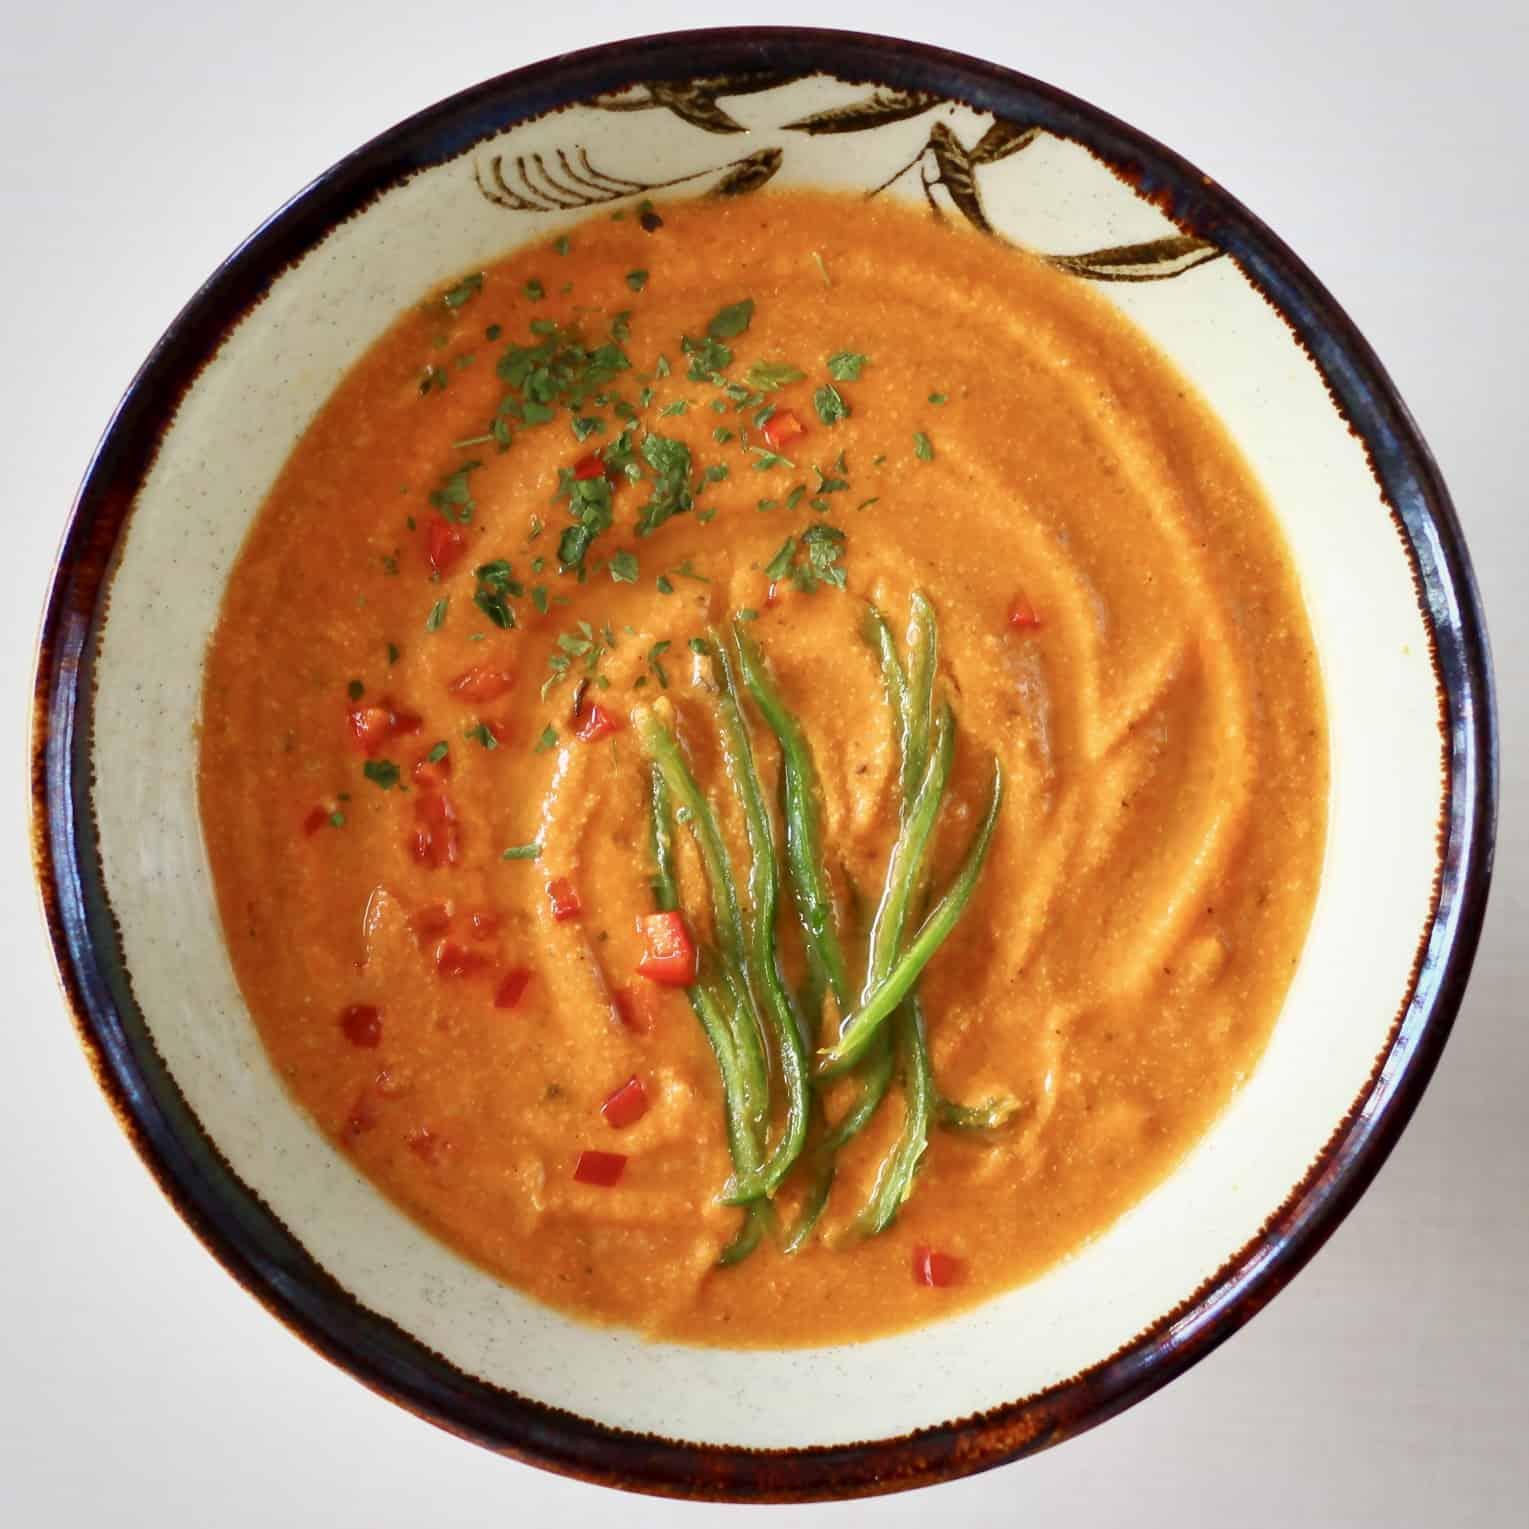 Creamy Vegan Tomato Soup (GF)